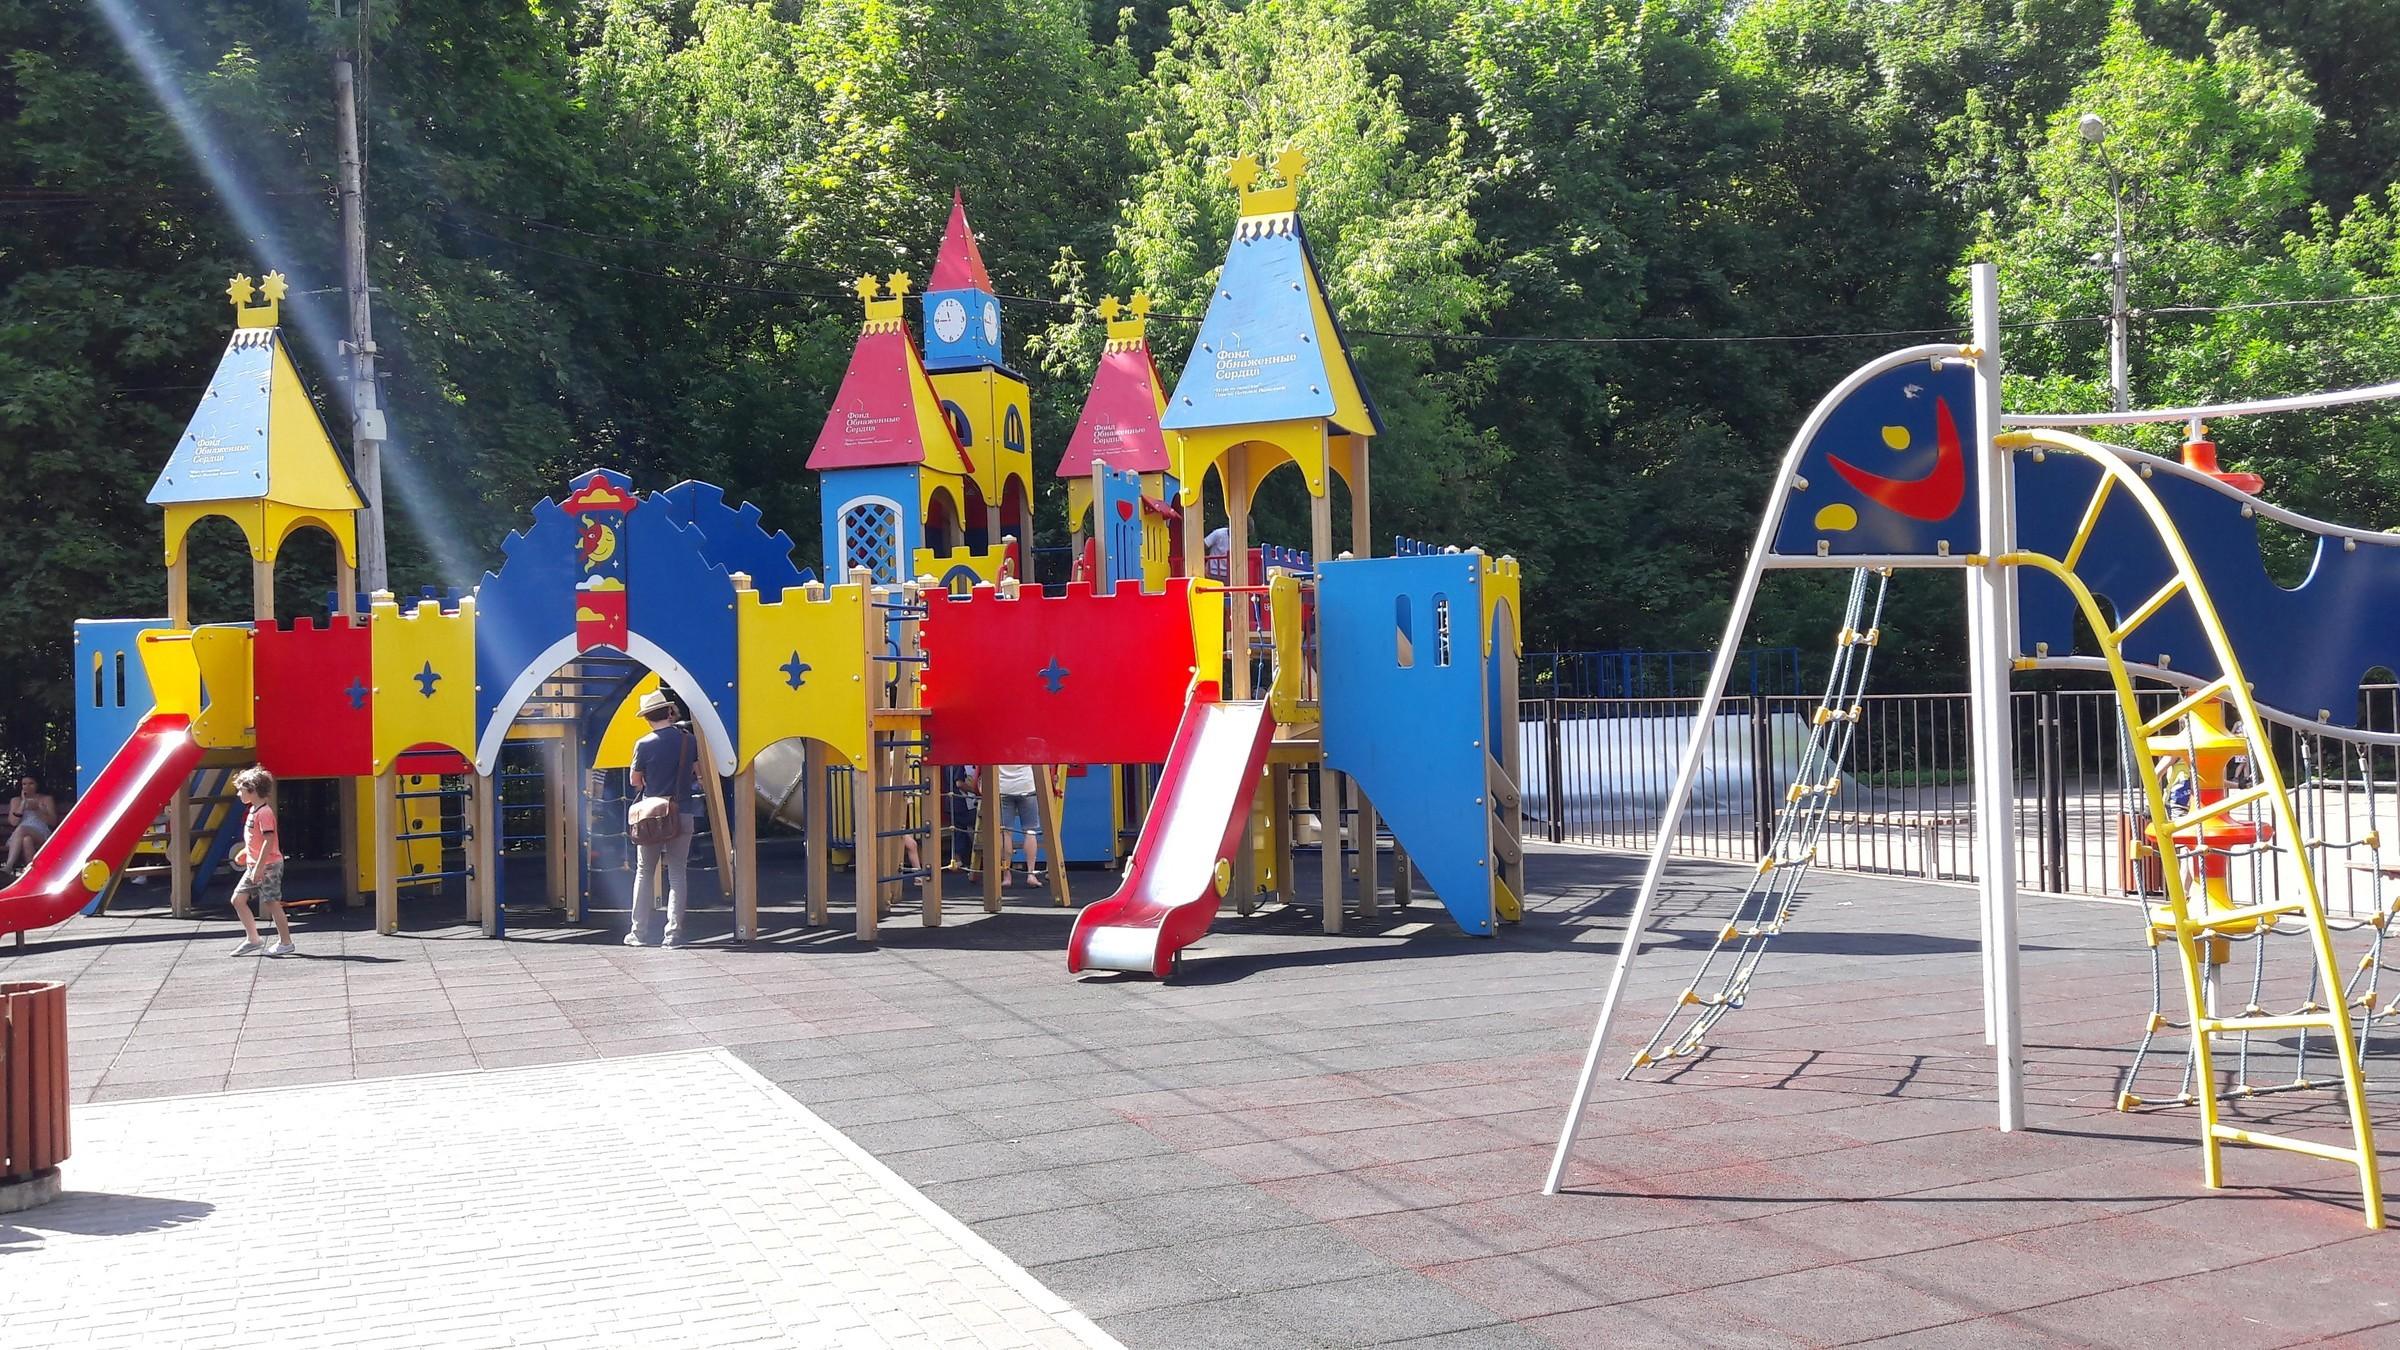 c6d1a5c9 Парк Сокольники, Москва 2019: отели рядом, каток, фото, видео, как ...